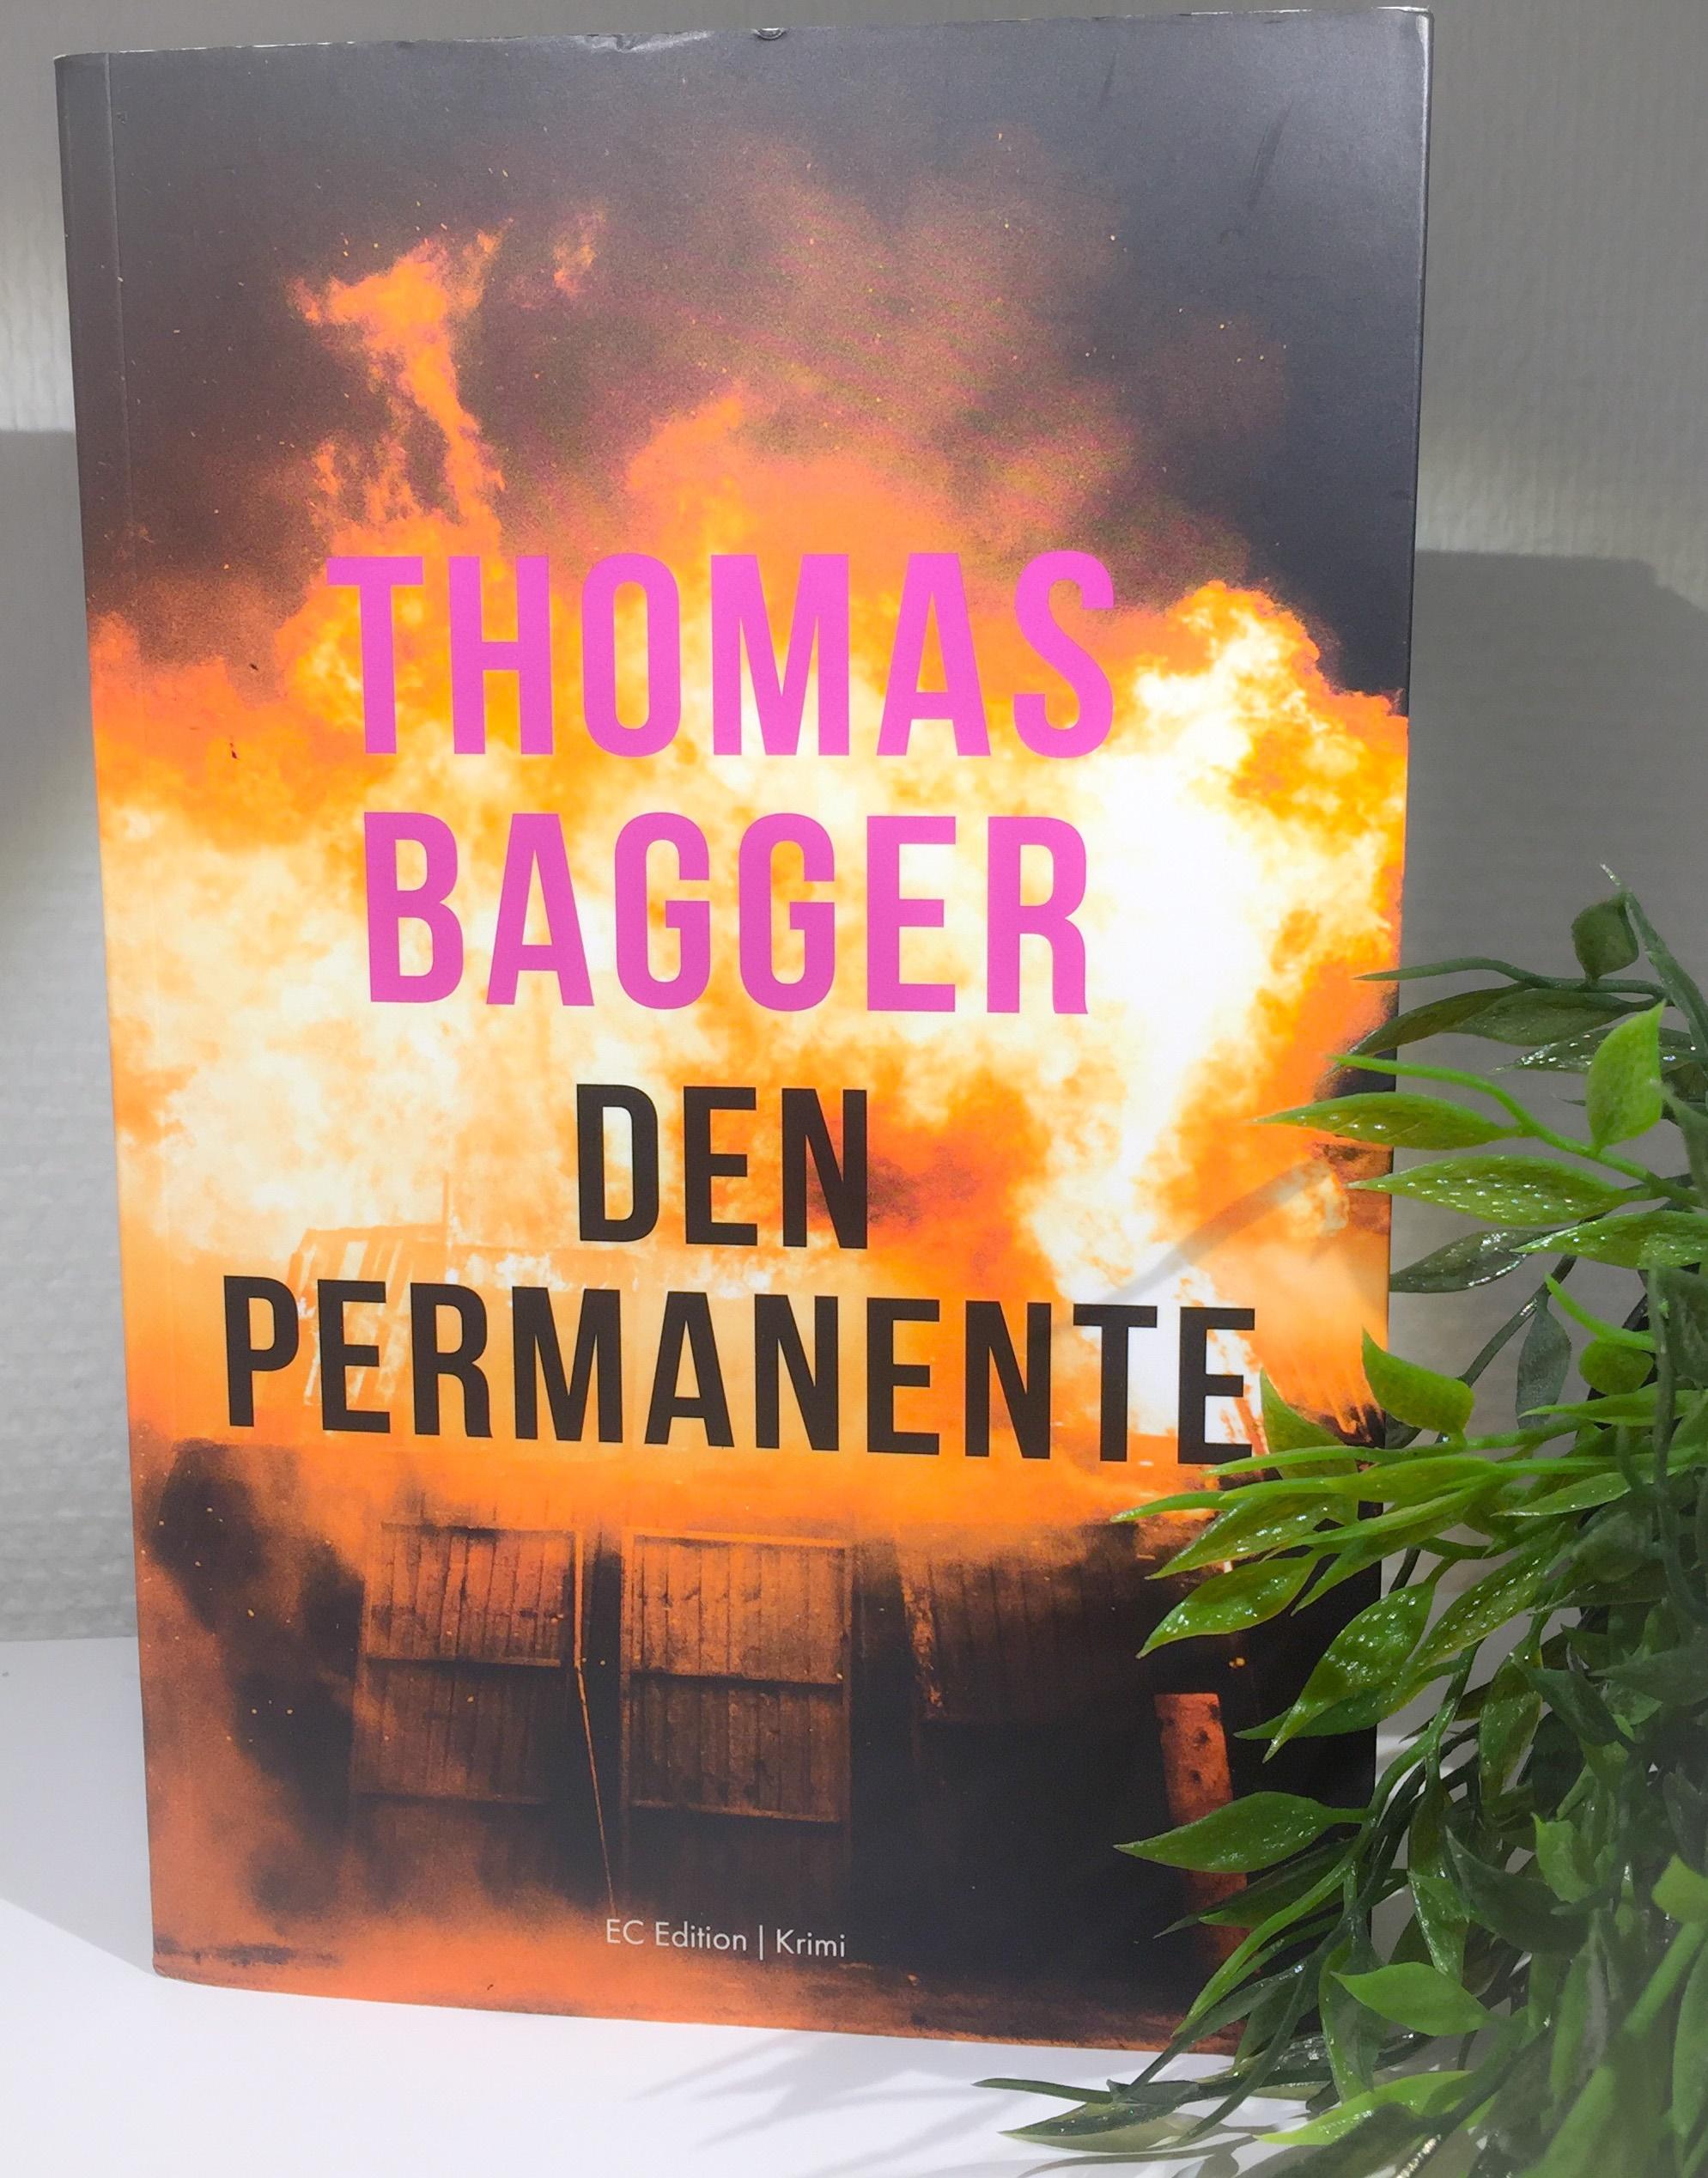 Thomas Bagger, Thomas Bagger Den Permanente, Den Permanente, Ask Hjortheede, Camilla Staal, Krummeskrummelurer, Krimidebutant, Sander Ravn,